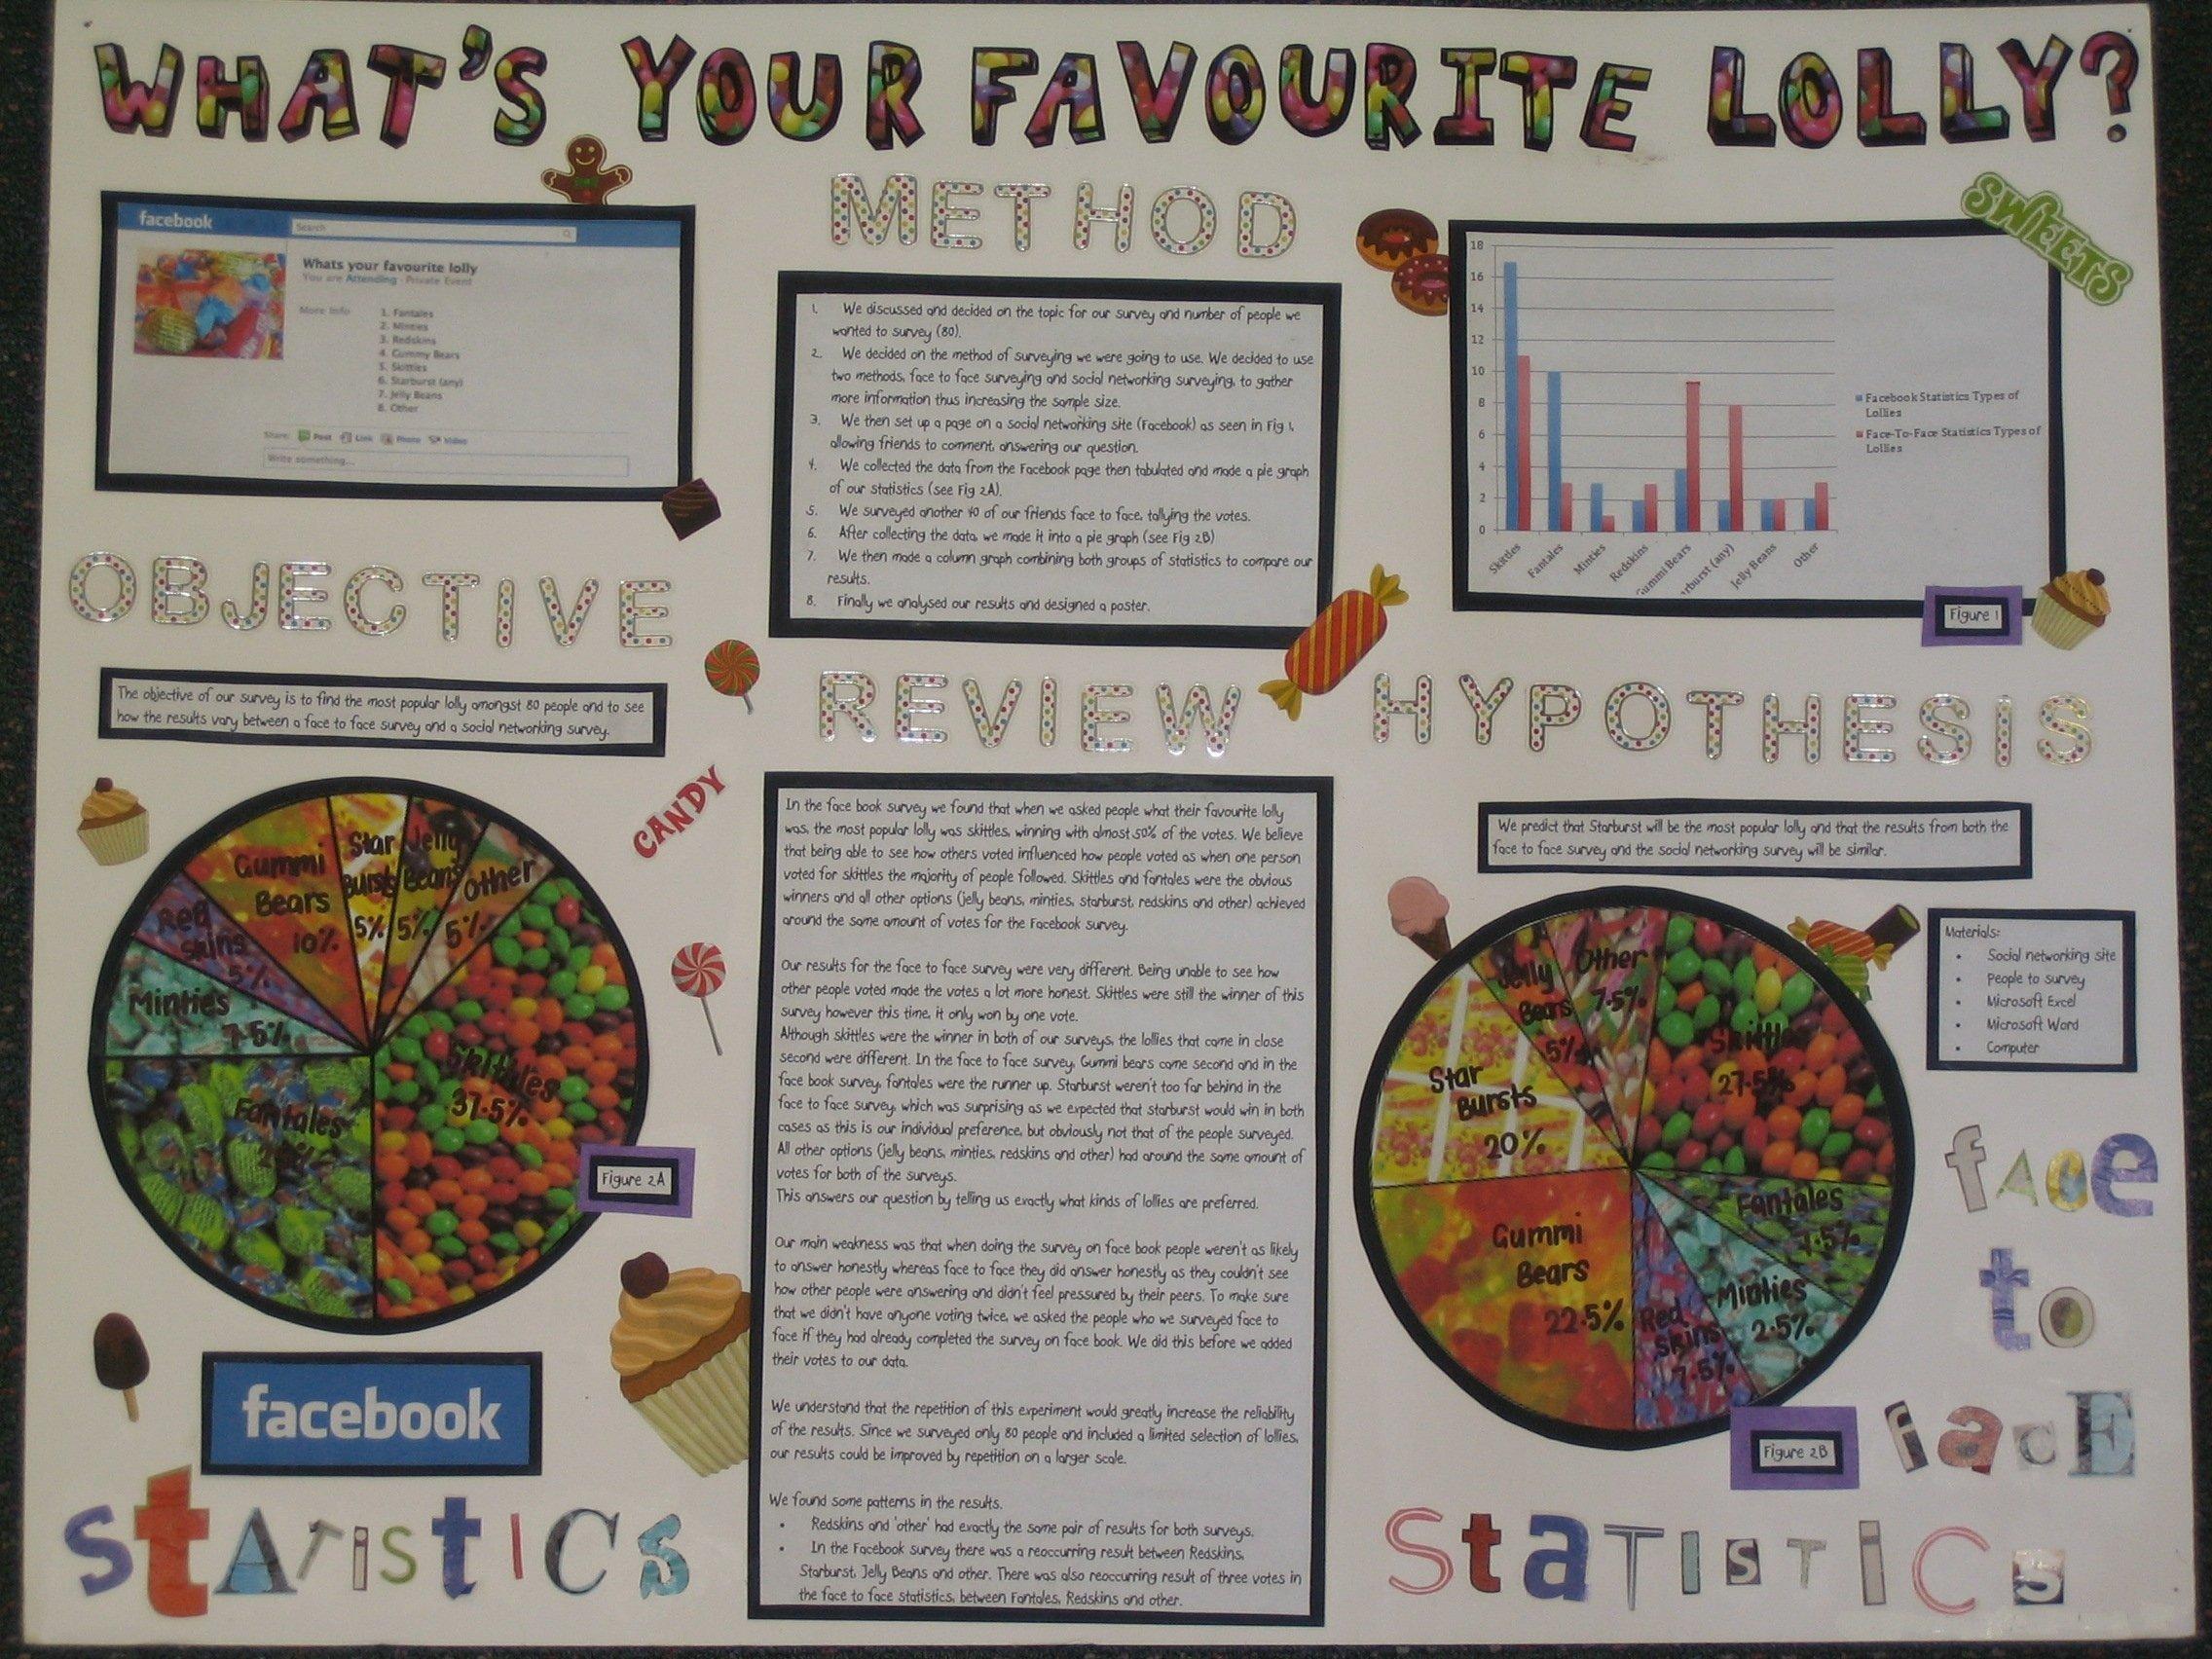 10 Stunning Creative Presentation Ideas For School 27 great creative school project presentation 2 2021